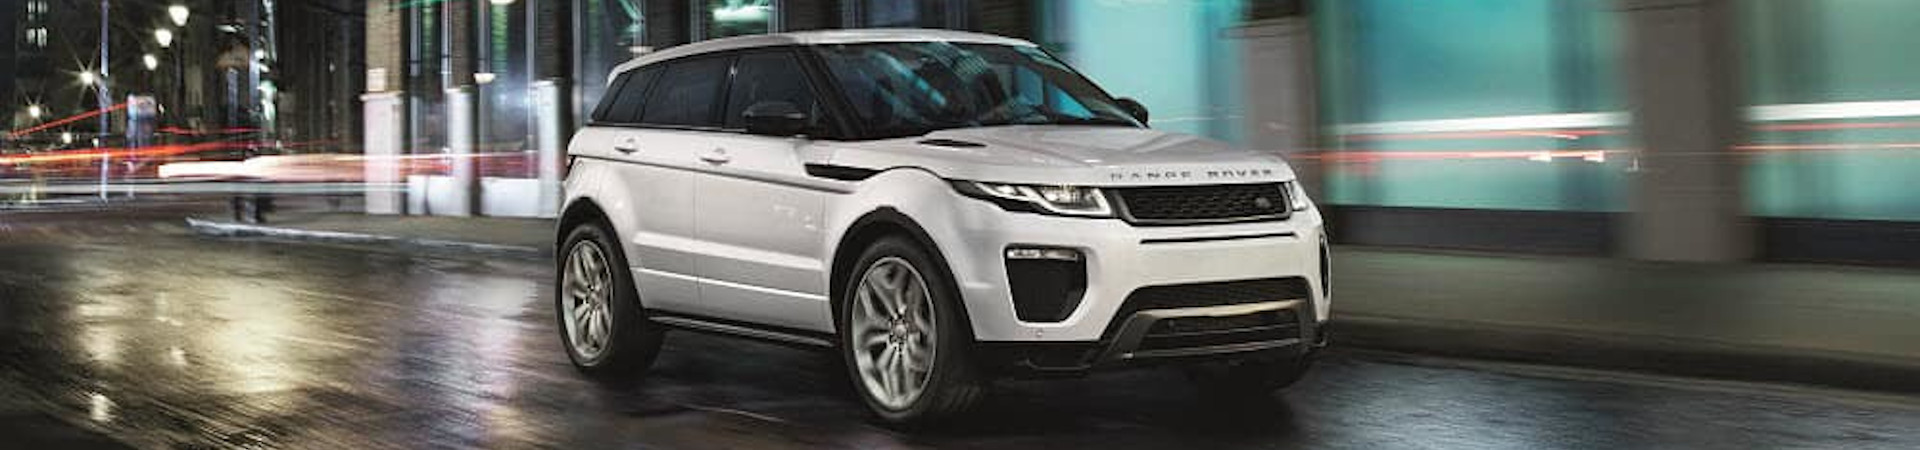 Land Rover onderhoud | Auto Kardol